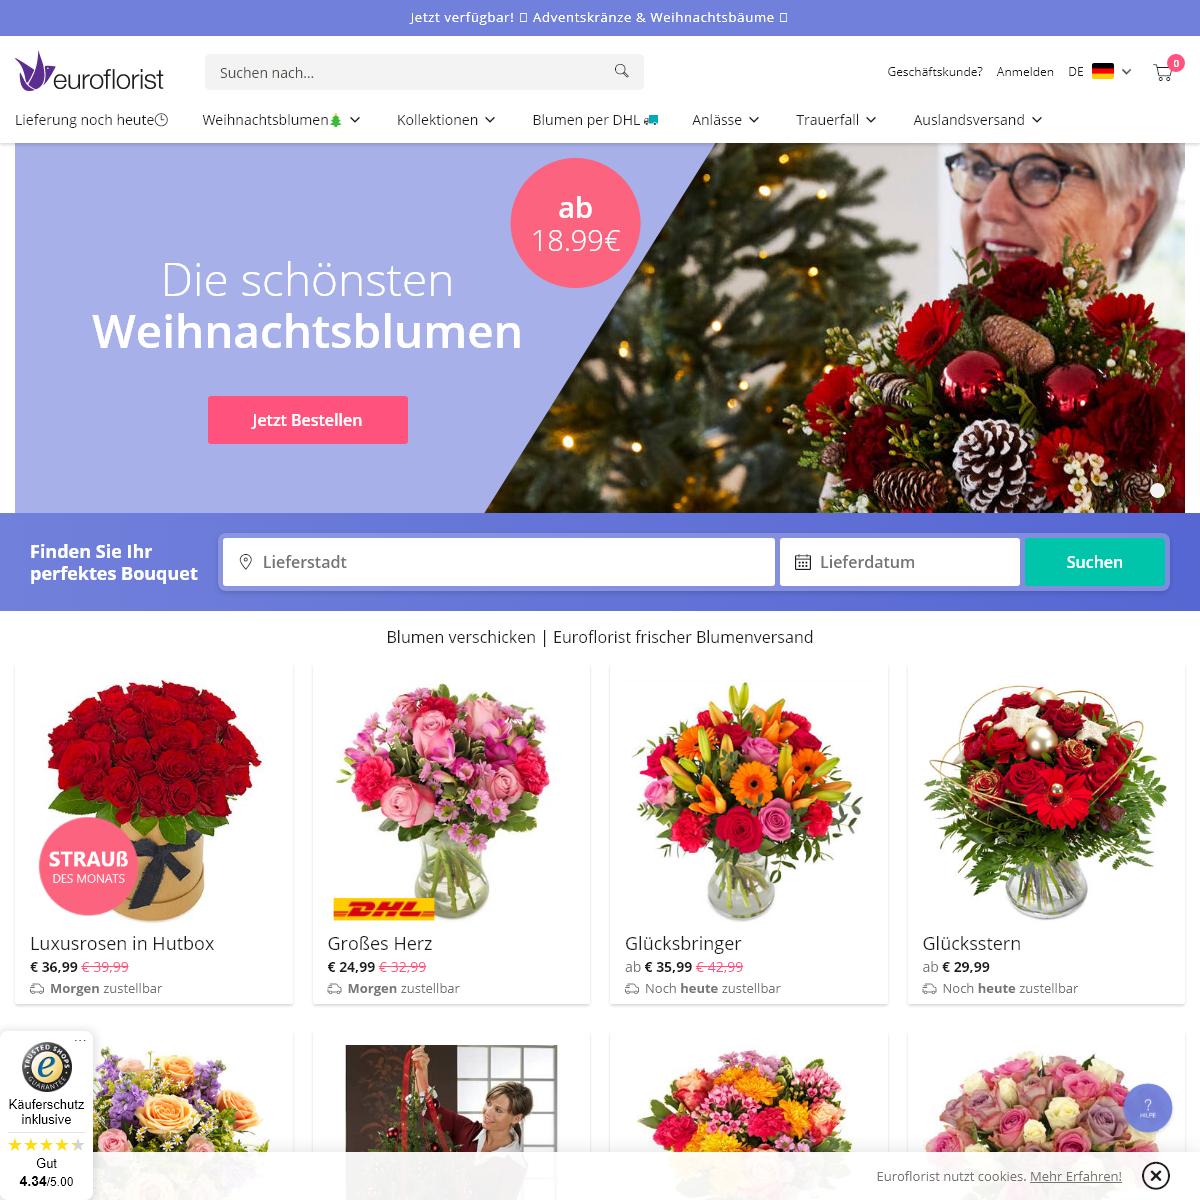 Blumen verschicken - Euroflorist frischer Blumenversand